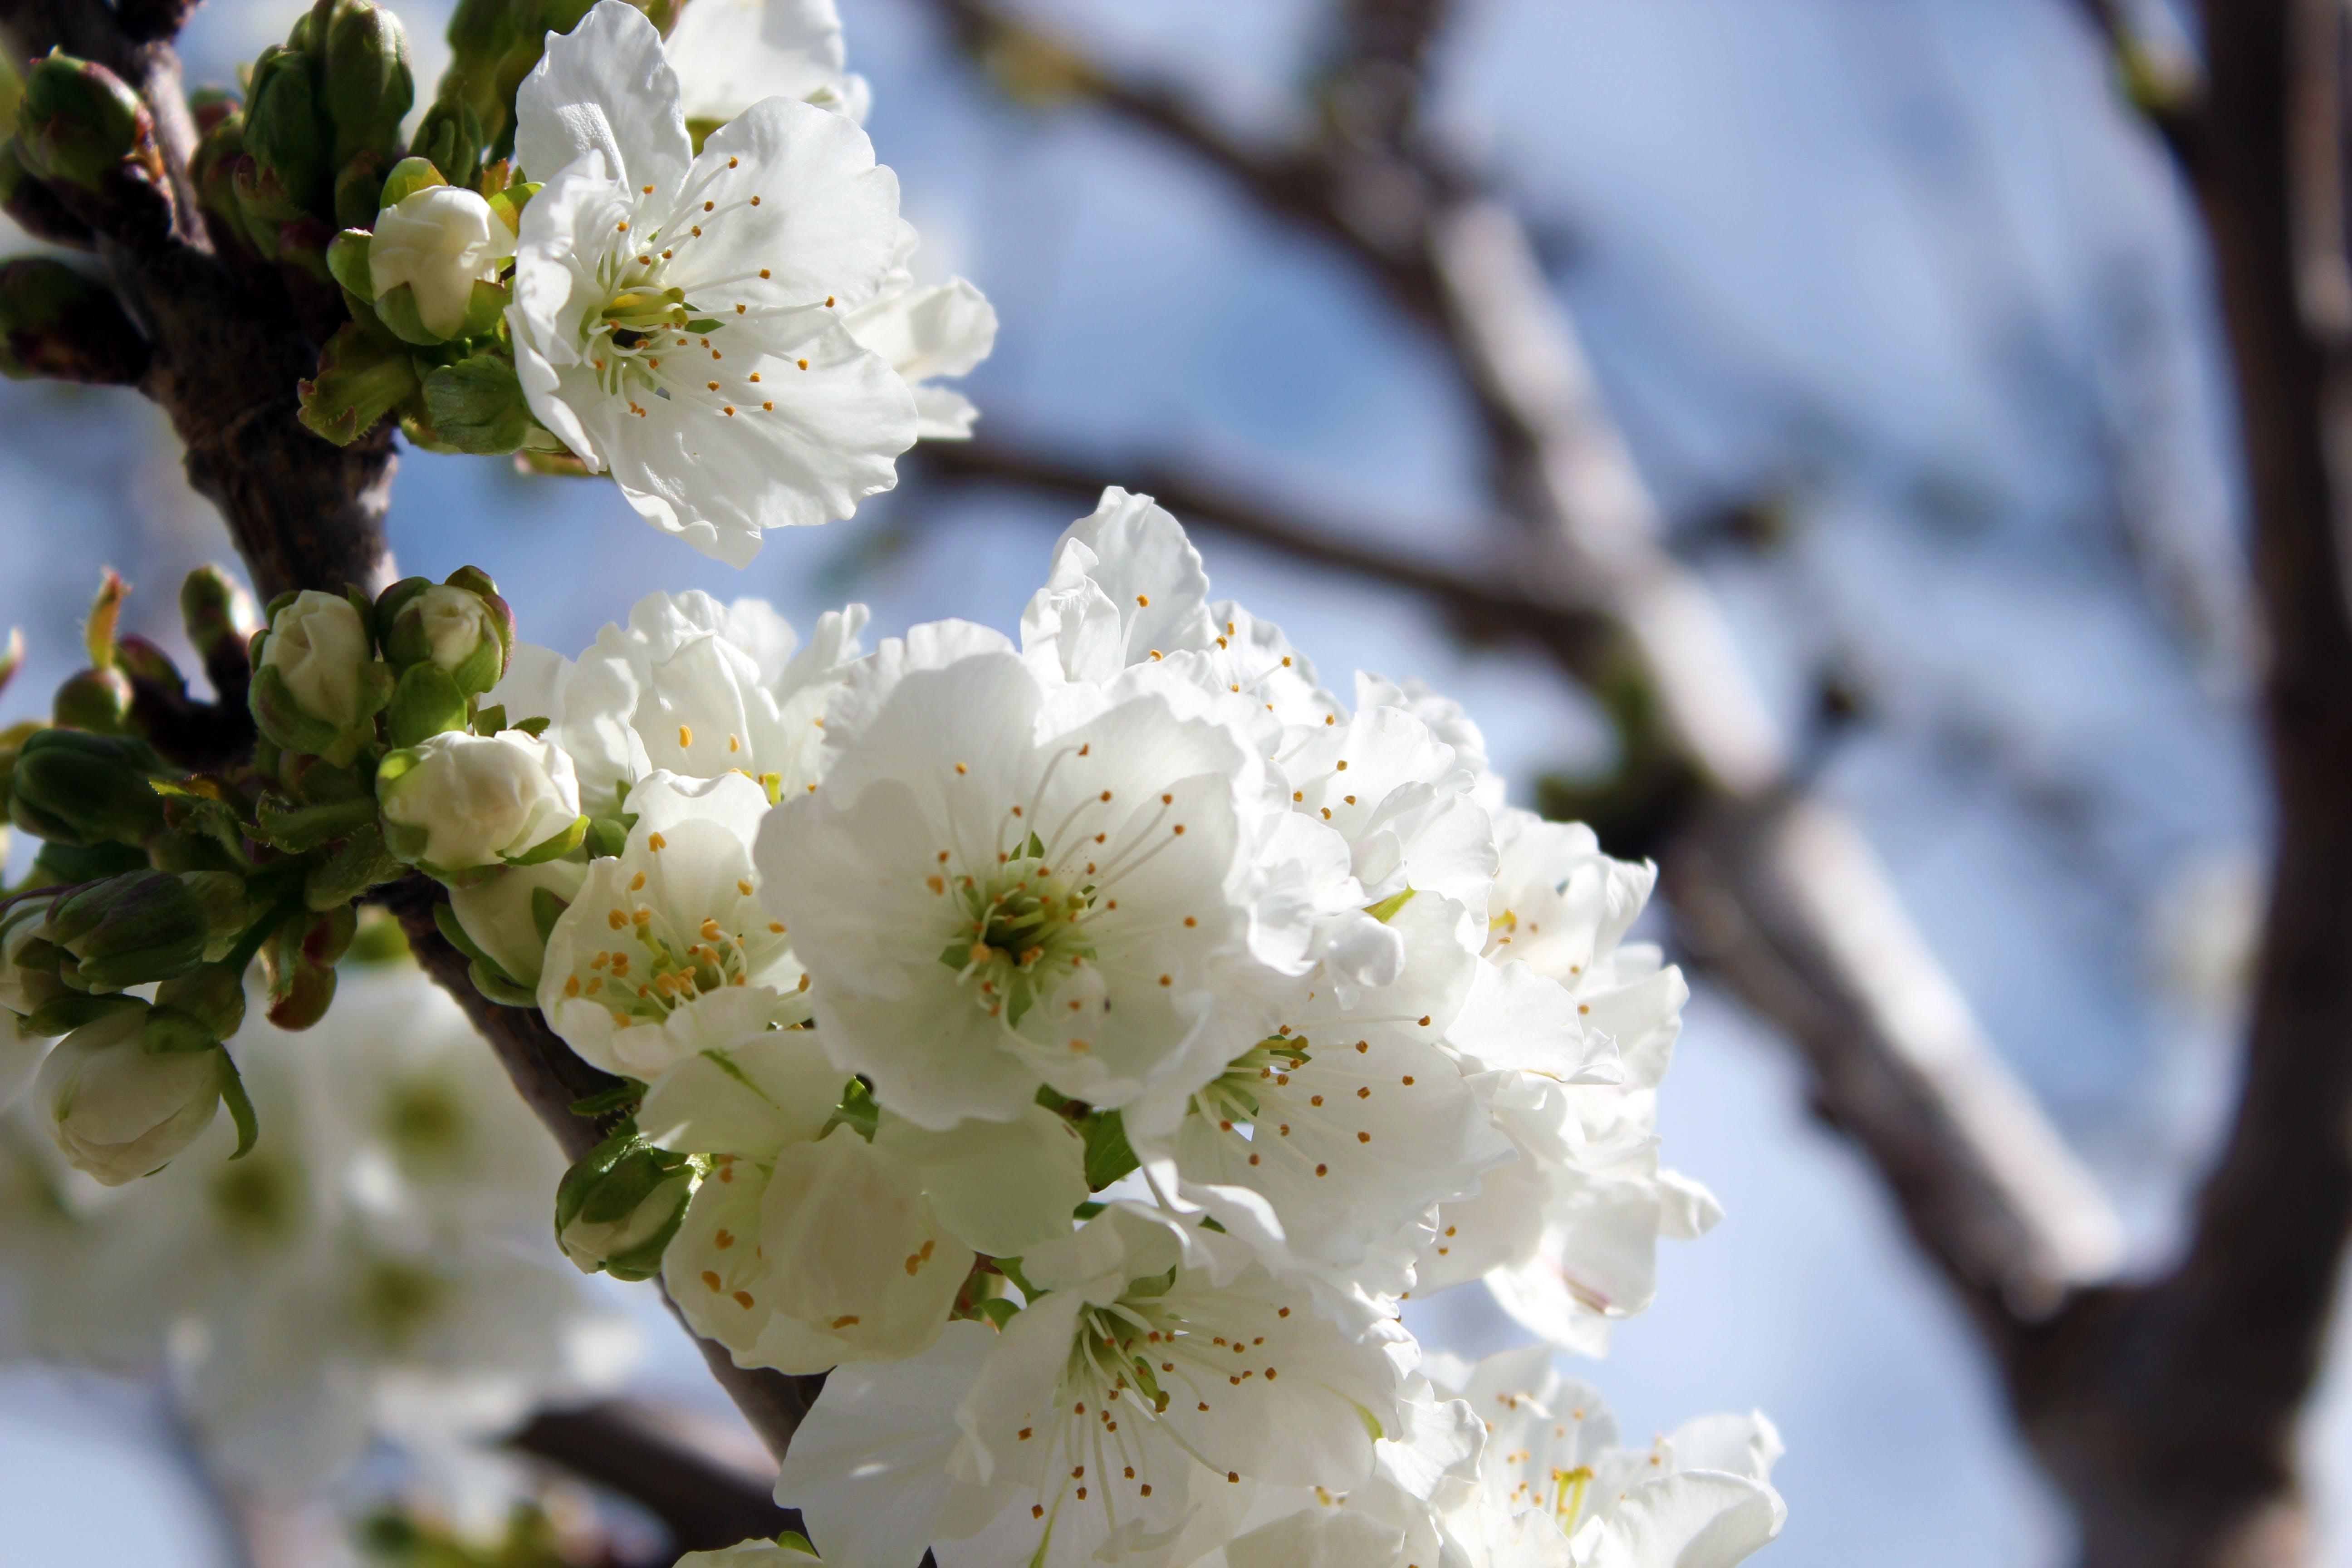 Free stock photo of cherry tree flowers, white flowers